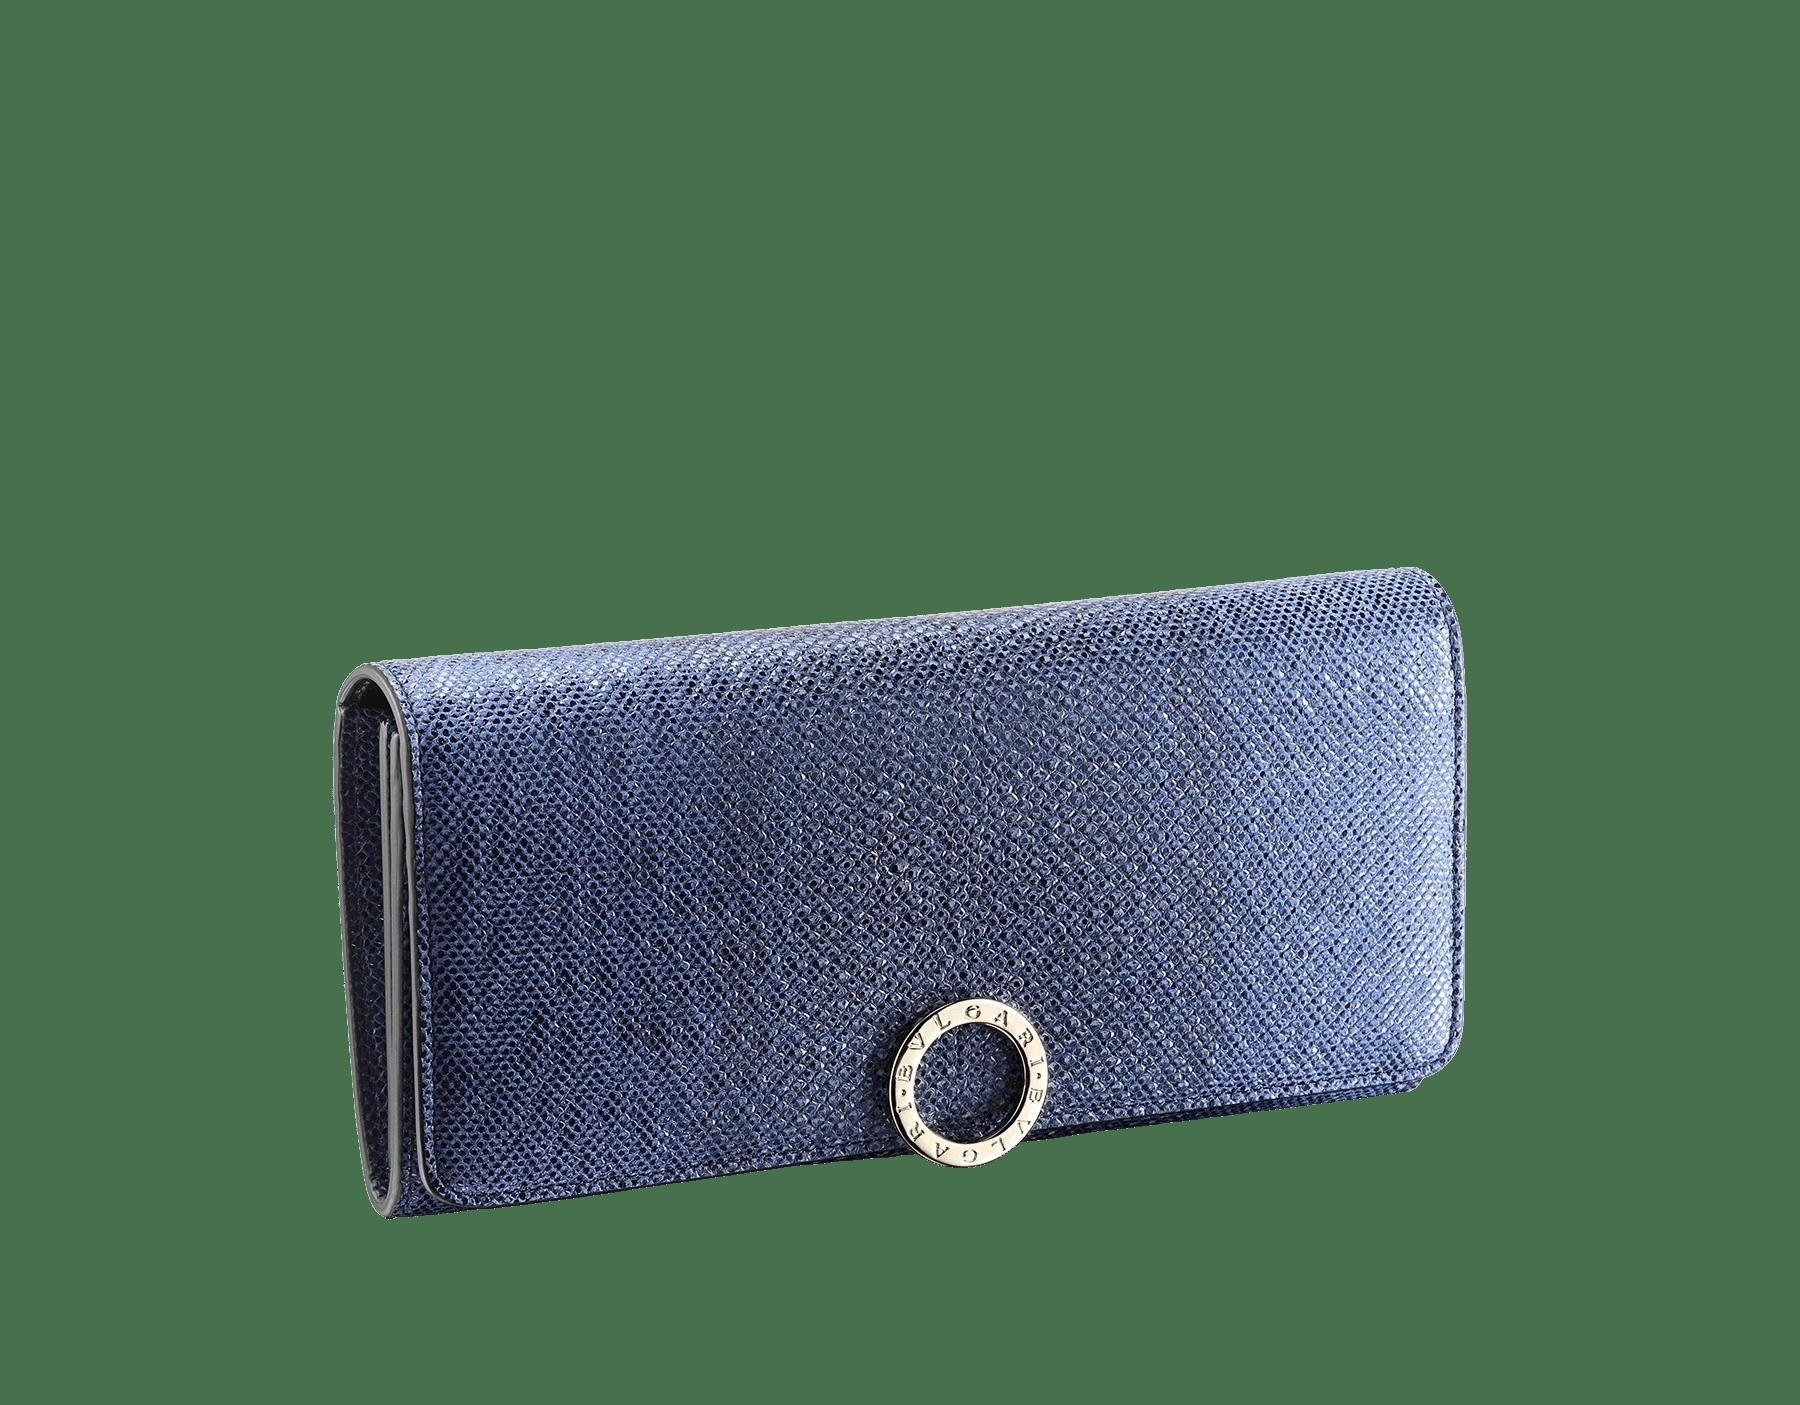 """BVLGARI BVLGARI"" large wallet in metallic Midnight Sapphire blue karung skin and black calfskin. Iconiclogo clip closure in light gold plated brass. 579-WLT-SLI-POC-CL-MK image 1"